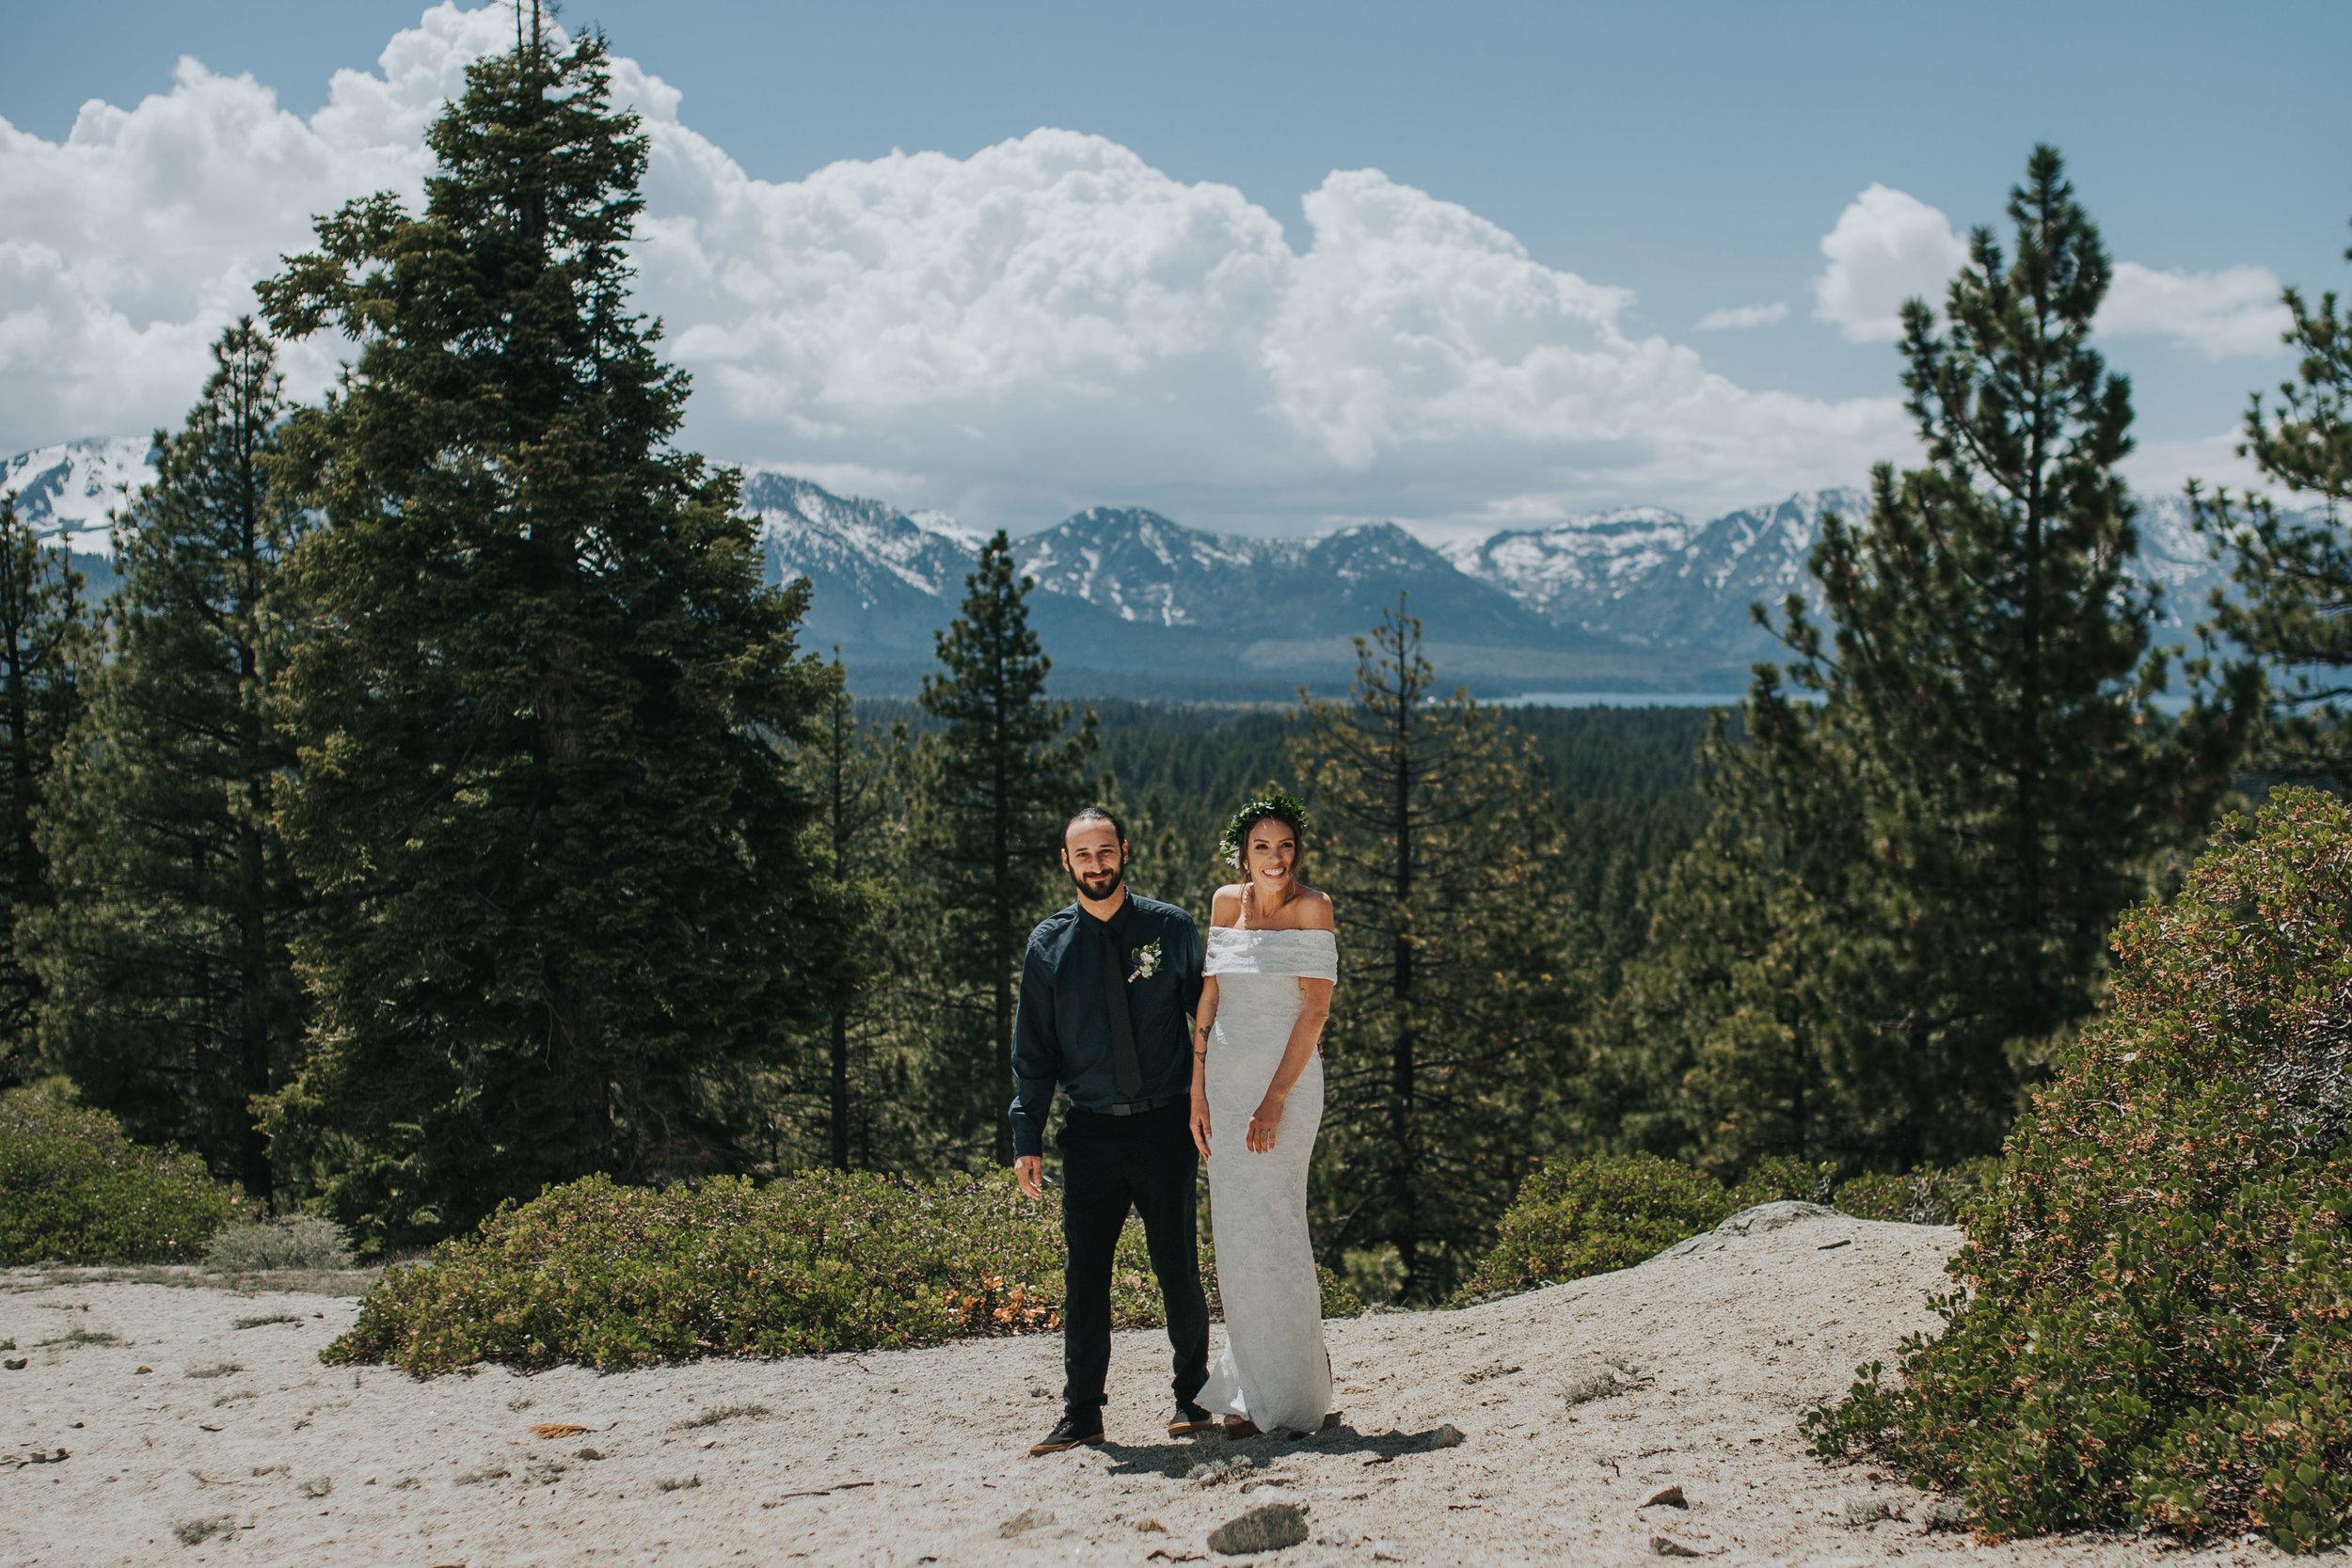 south-lake-tahoe-elopement-valerie-lendvay-photo-020.jpg